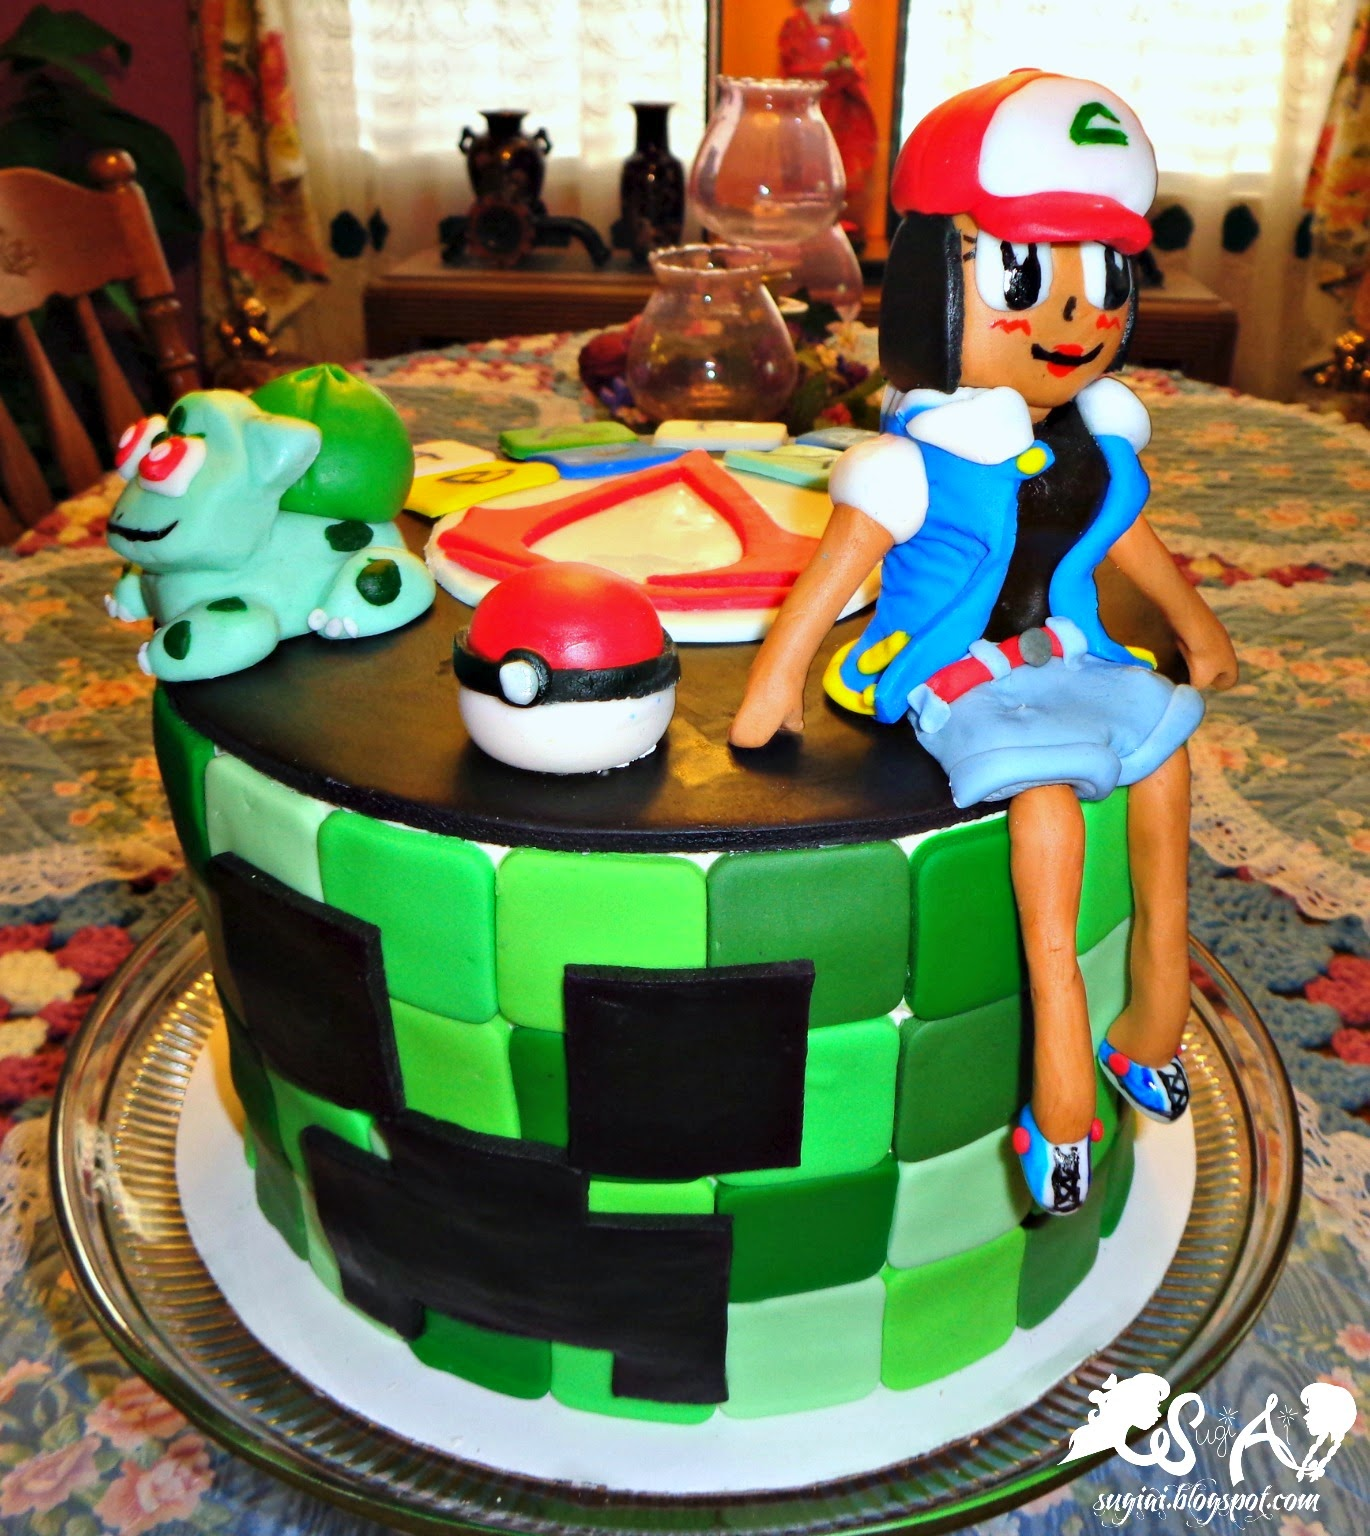 Lily Pad Cake Designs